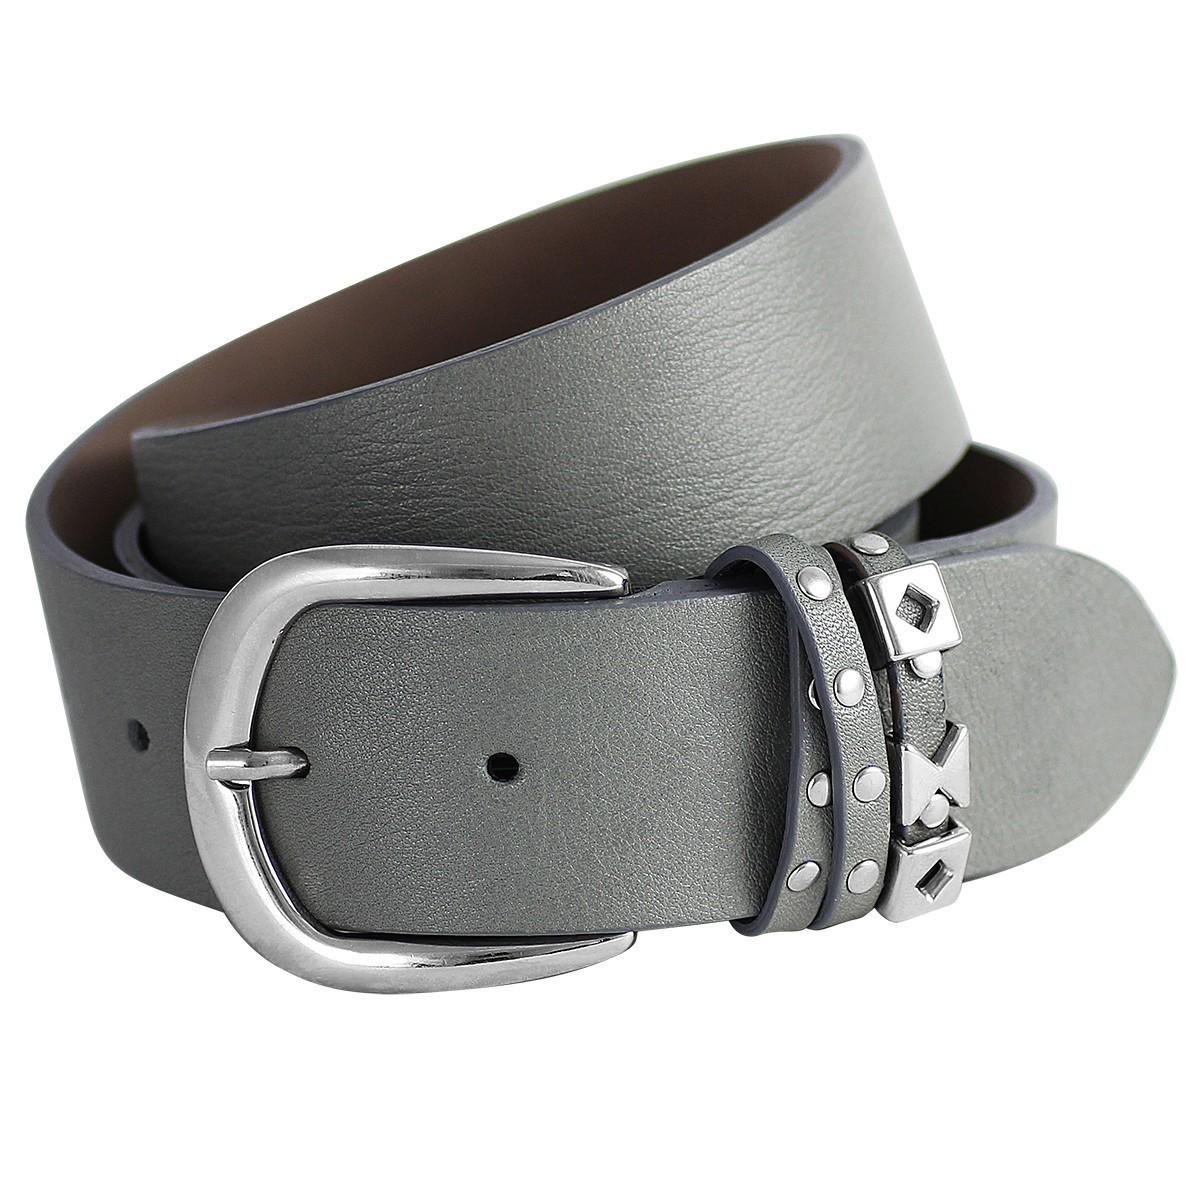 lederg rtel damen g rtel damen the art of belt 40072. Black Bedroom Furniture Sets. Home Design Ideas